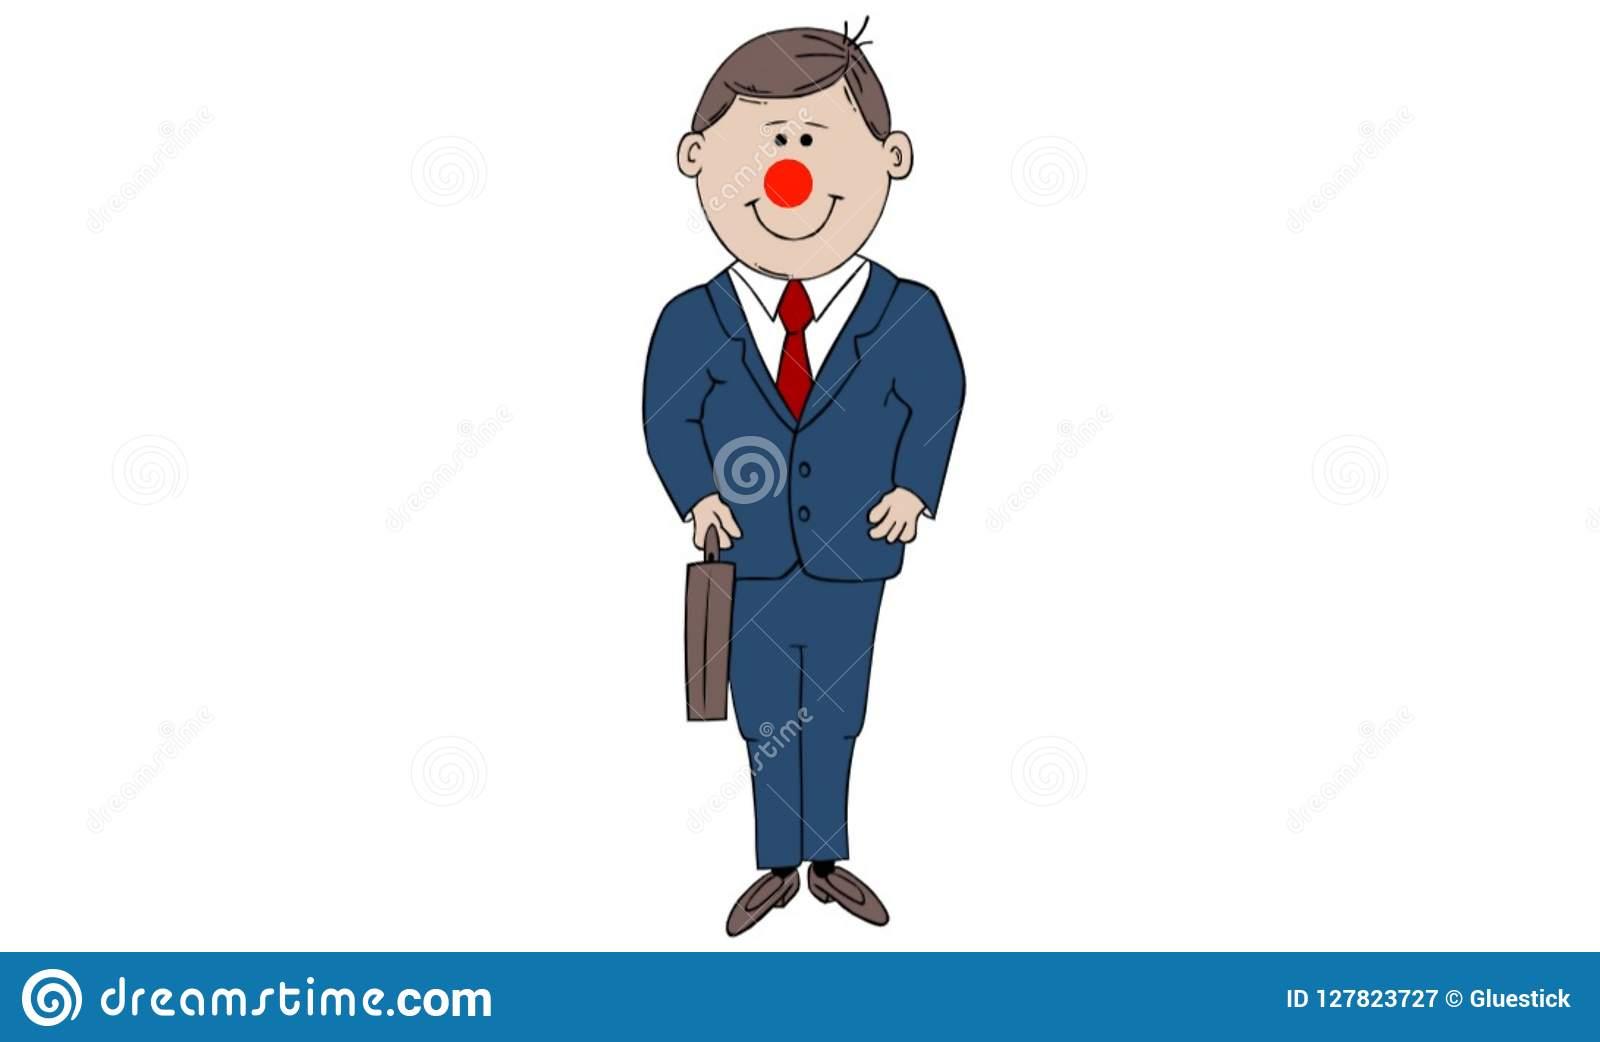 Cartoon Clipart Clown Business Man Stock Image.